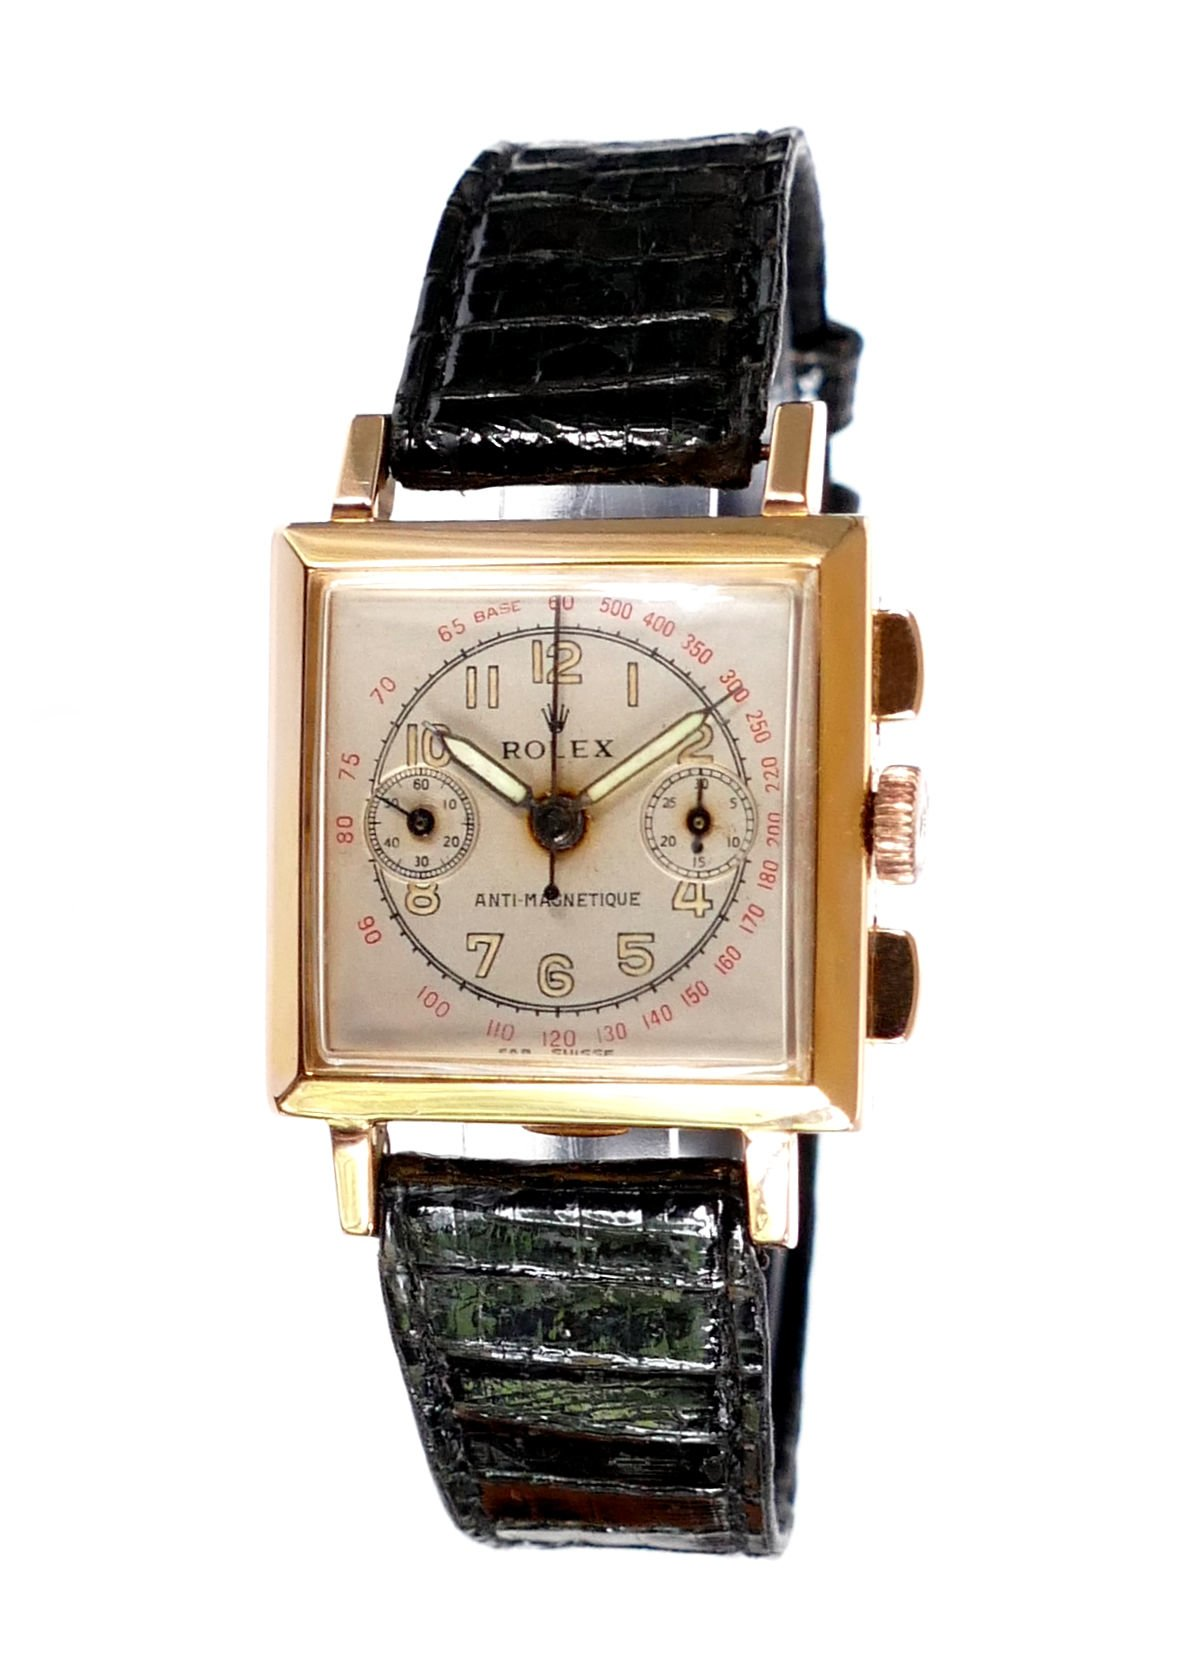 Rolex 3529 Chronograph